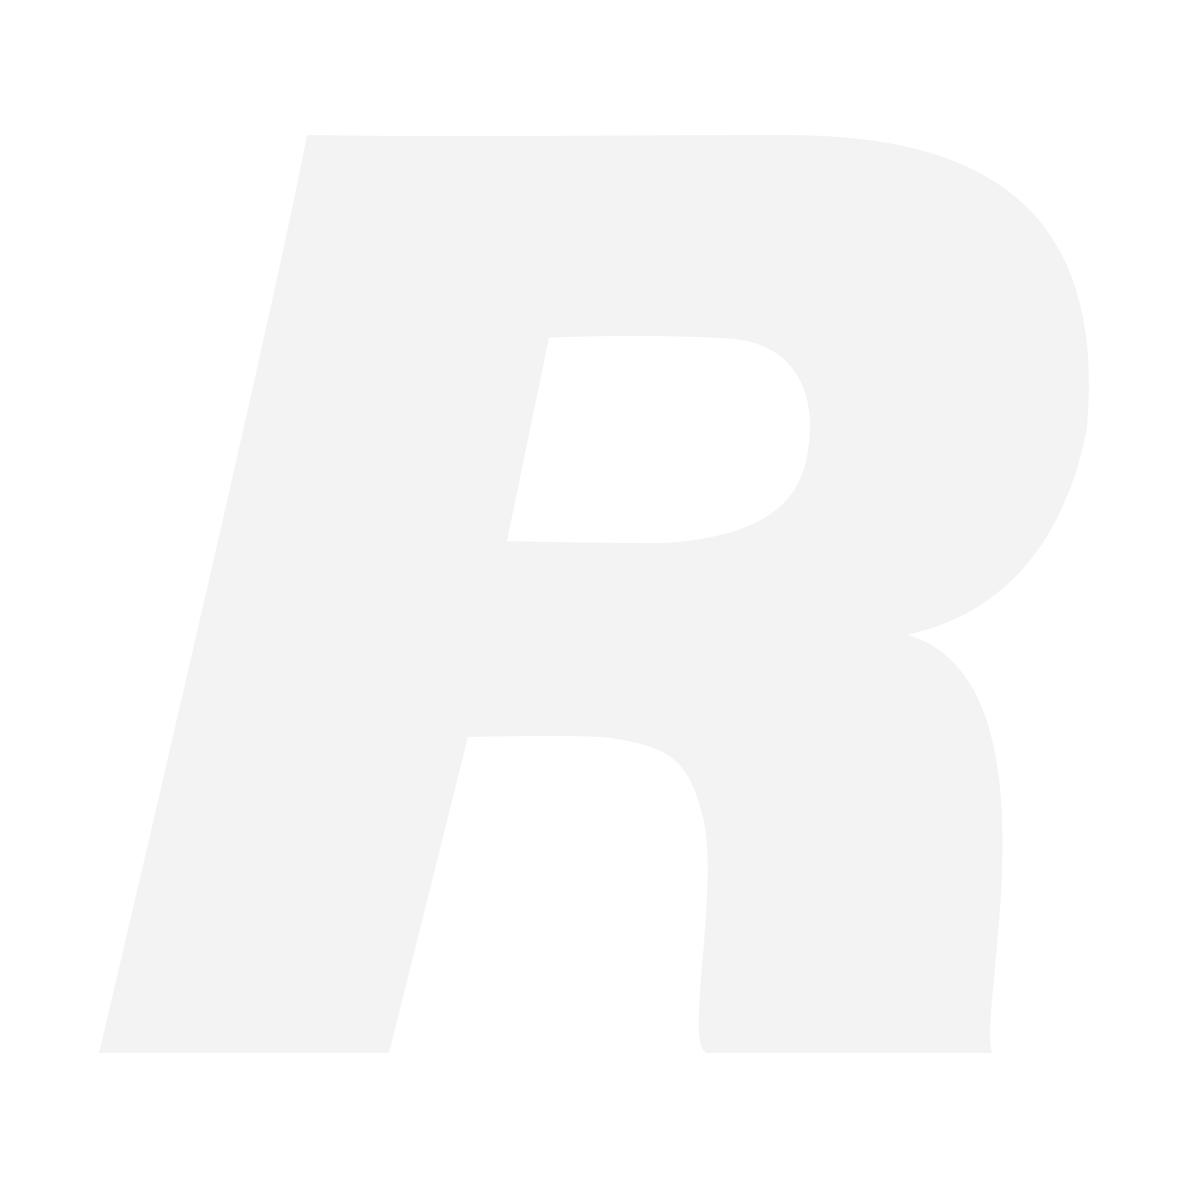 Manfrotto Pixi Extreme Mini Tripod + GoPro Adapter (MKPIXIEX-BK)